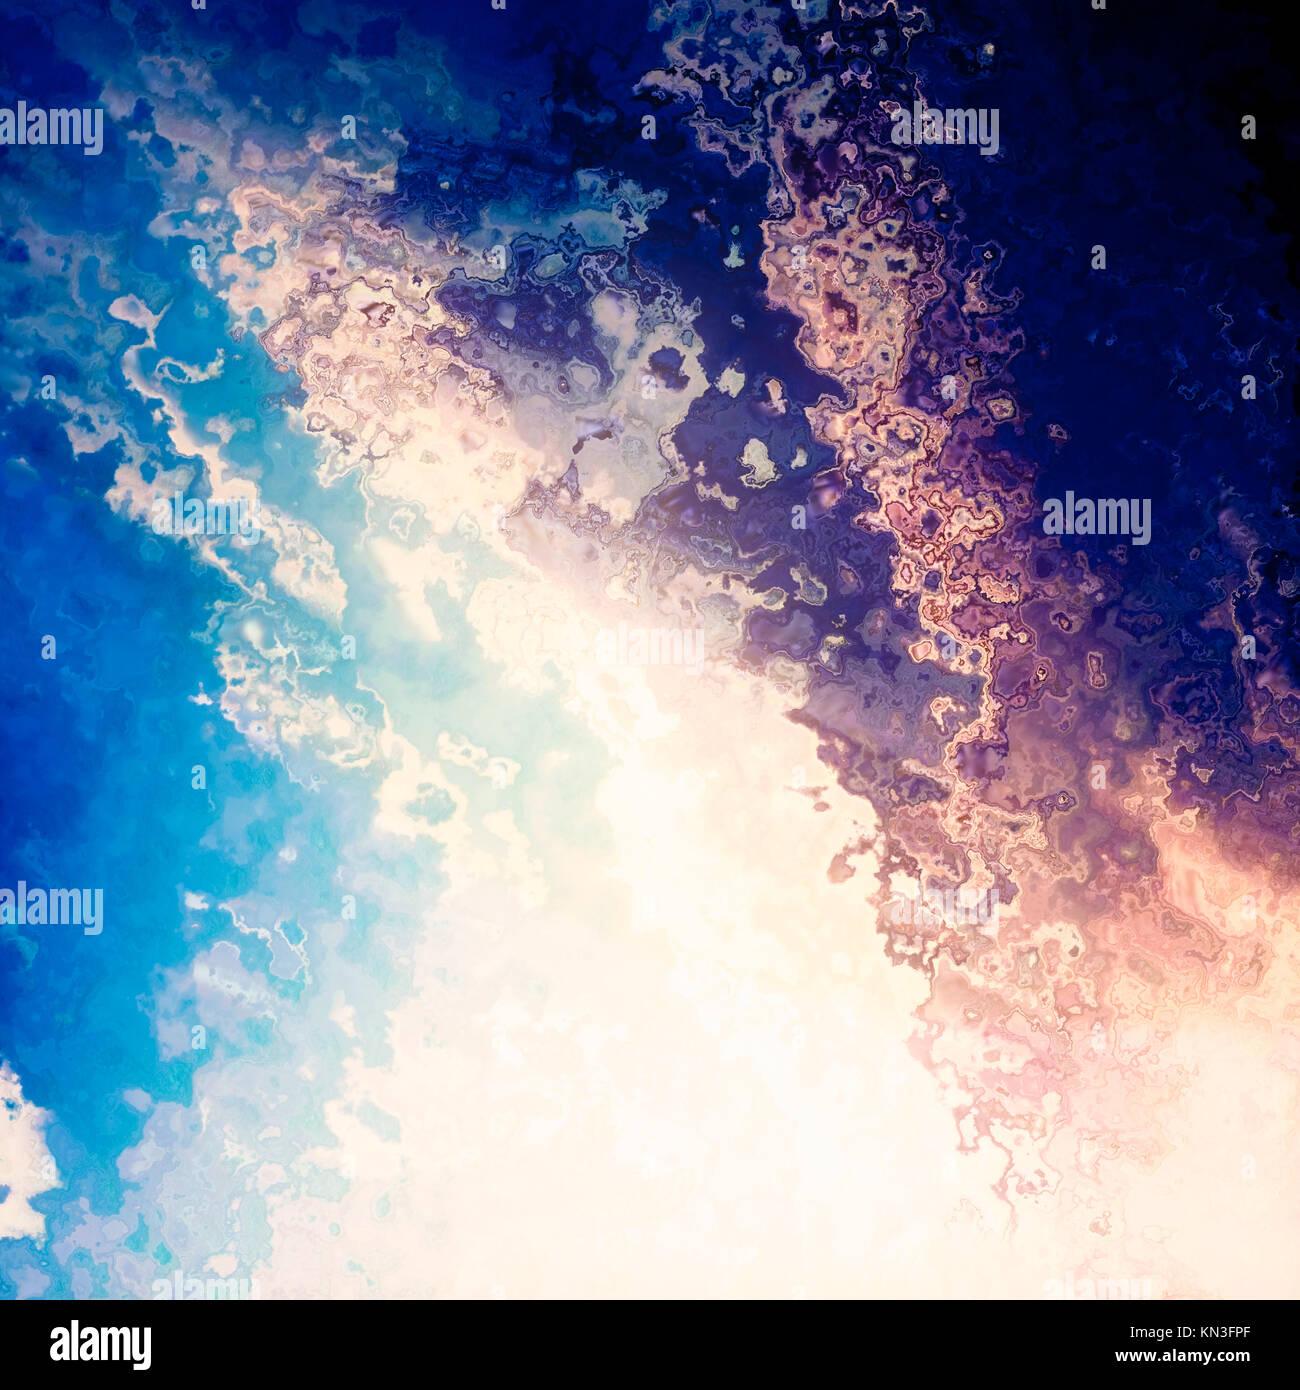 Bright light splash blue sky, abstract background illustration Stock Photo